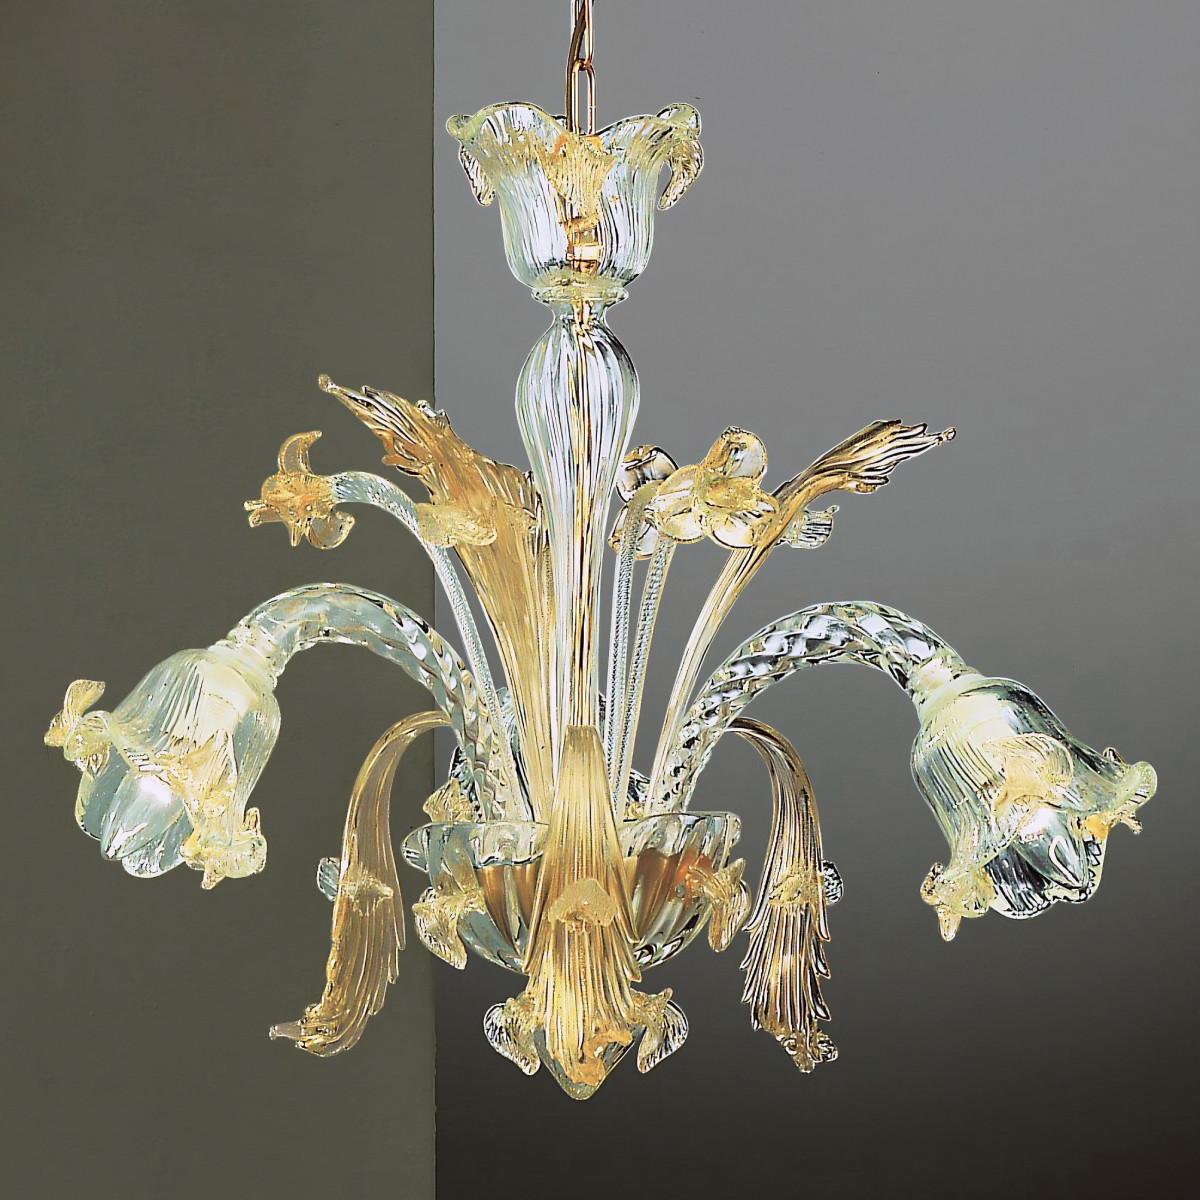 Vivaldi 3 flammig Murano Kronleuchter - transparente Gold Farbe